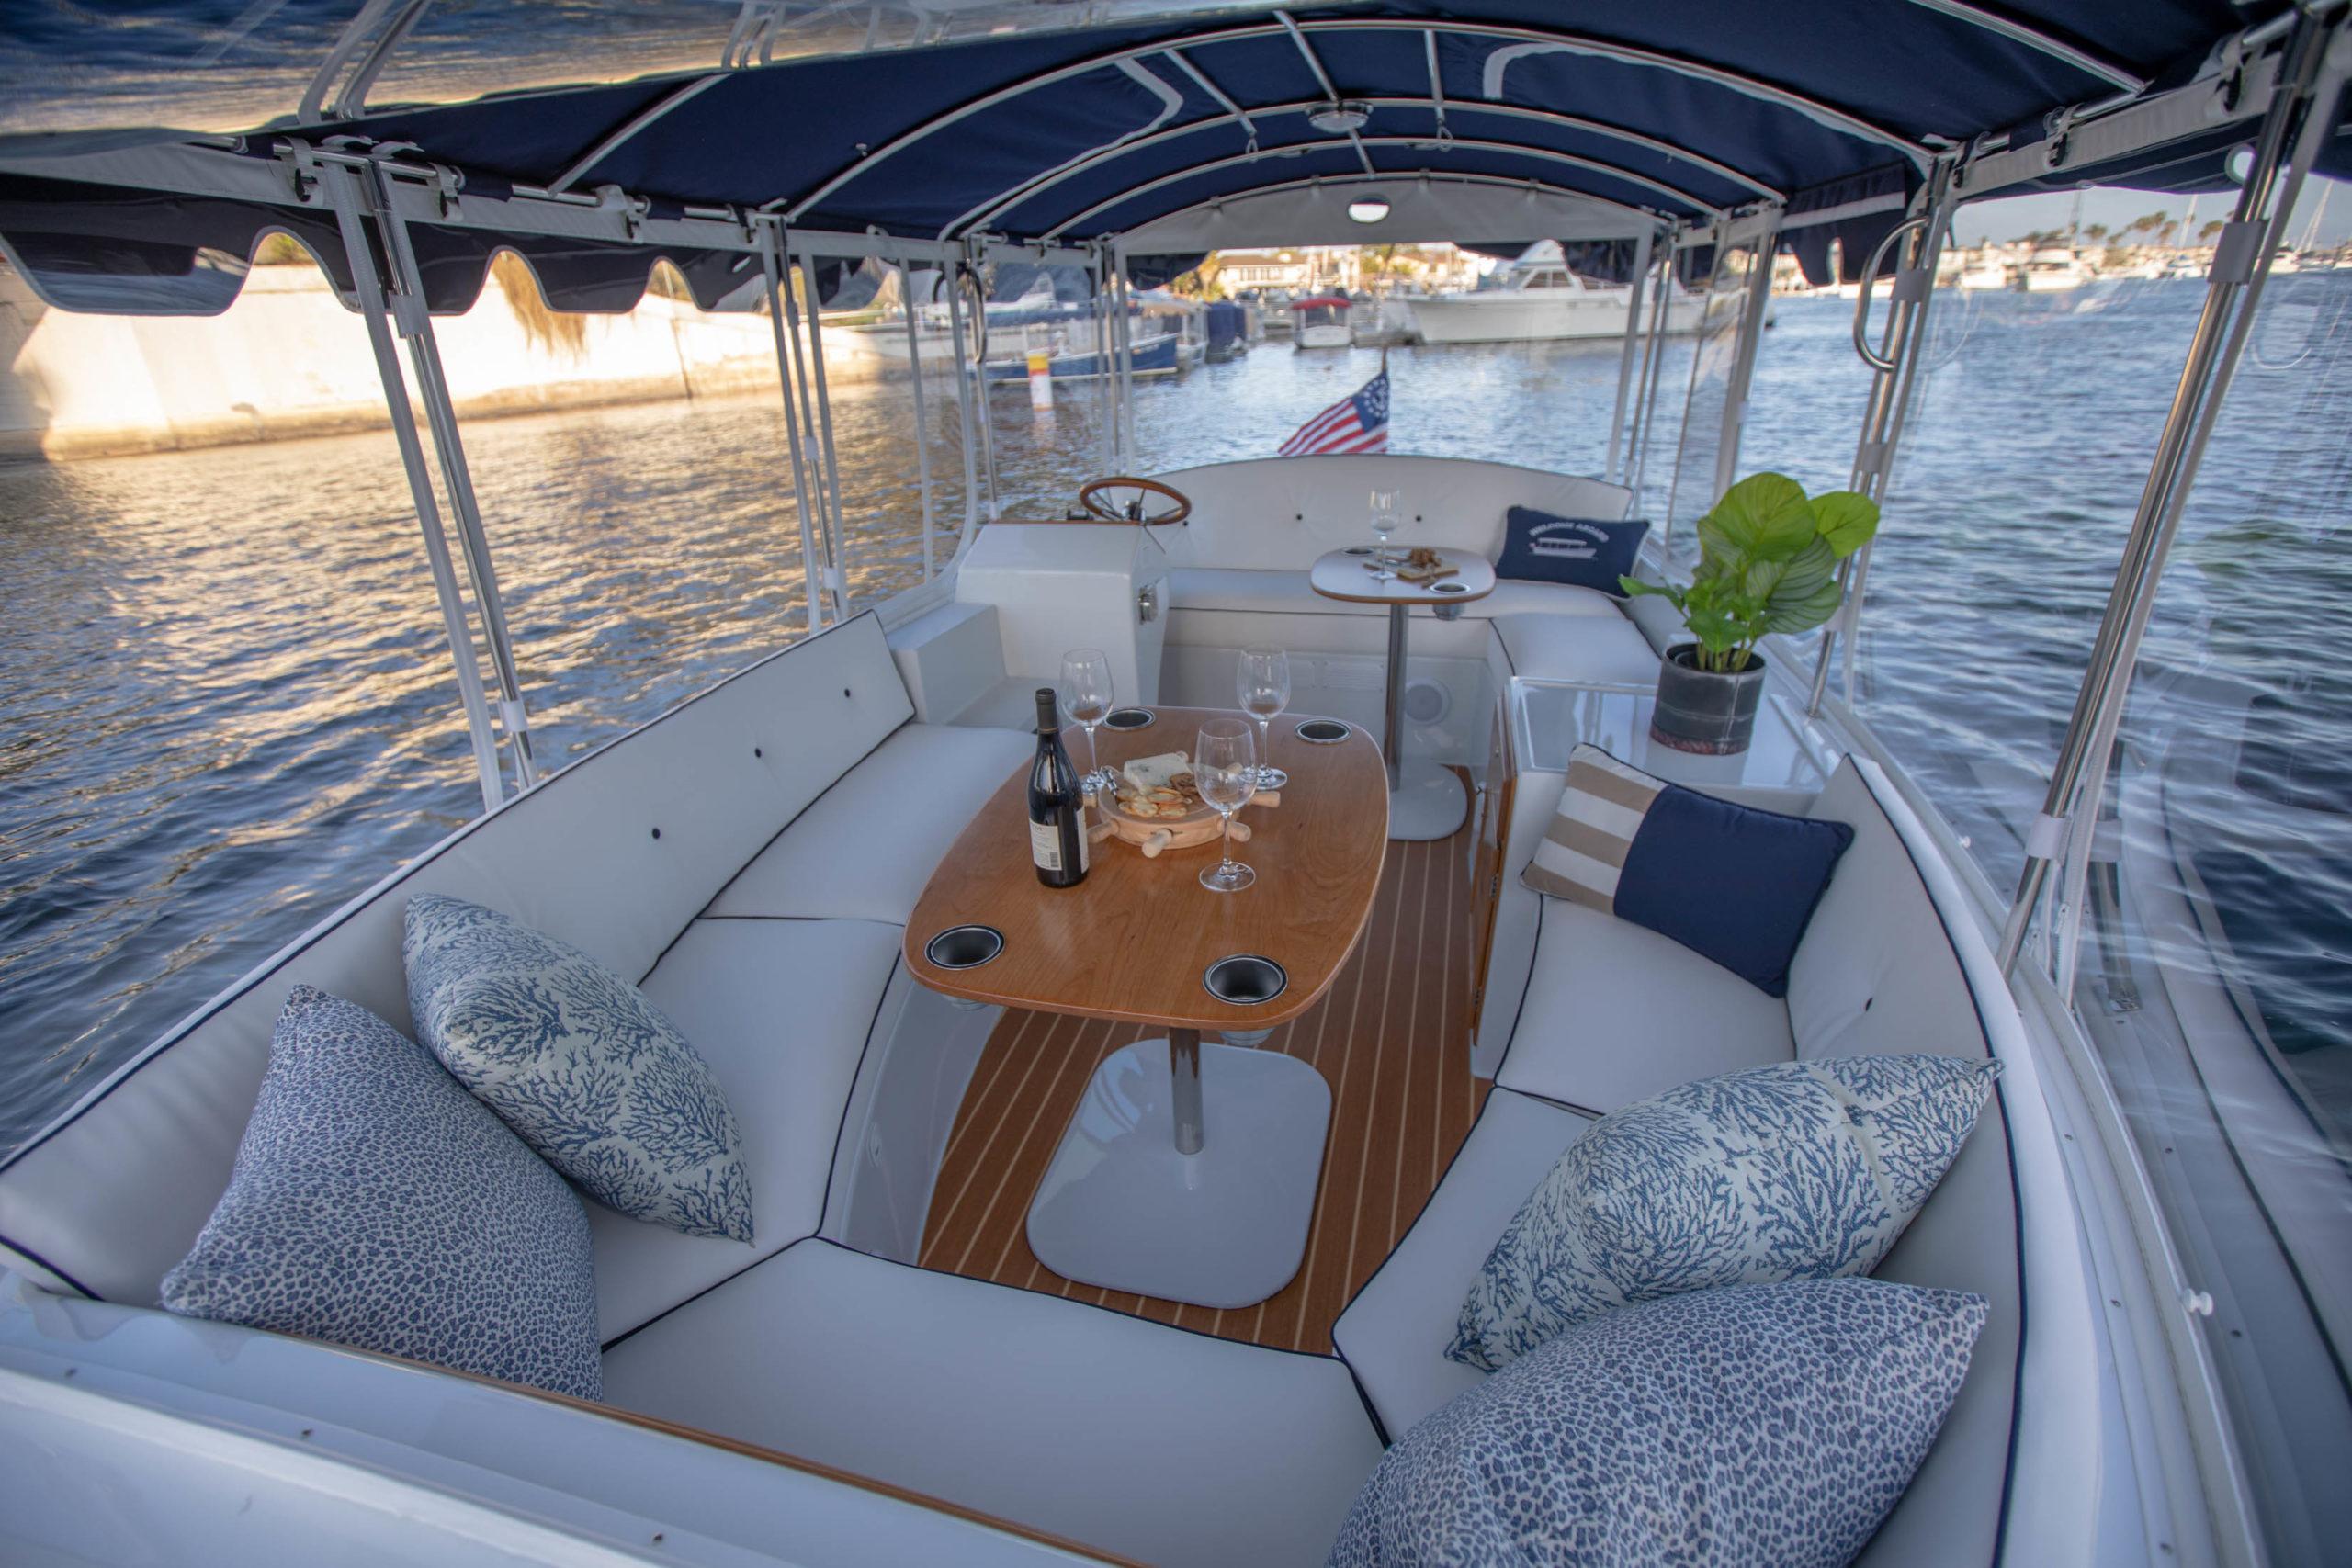 Duffy-Electric-Boats-18-Snug-Harbor-Interior-2020-13